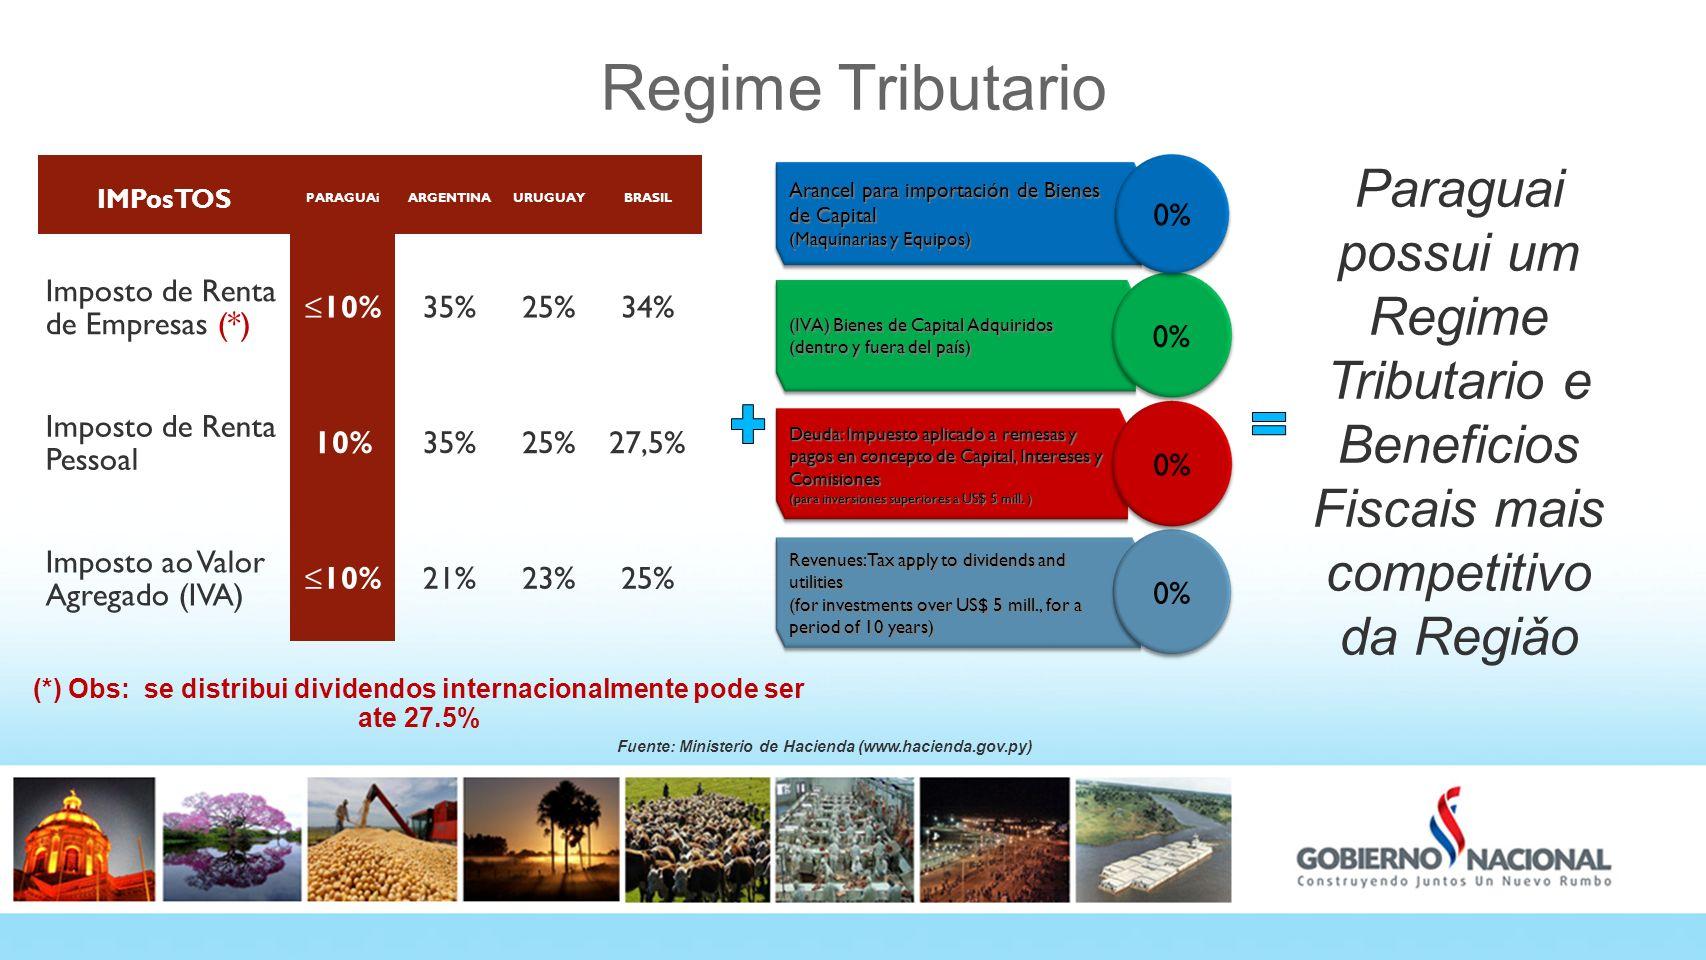 Regime Tributario Paraguai possui um Regime Tributario e Beneficios Fiscais mais competitivo da Regiǎo Revenues: Tax apply to dividends and utilities